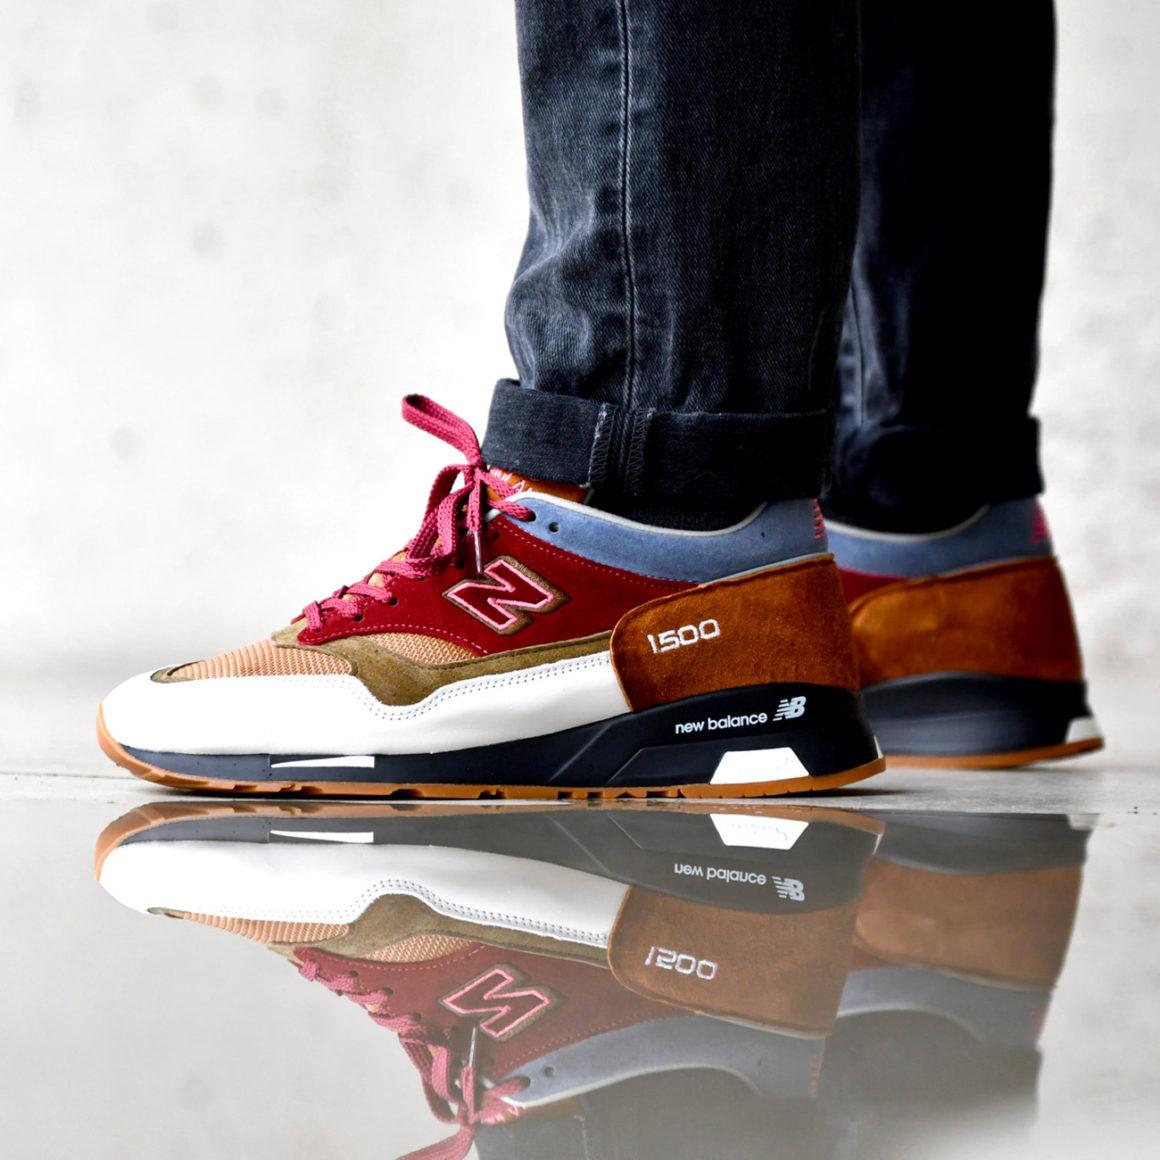 new balance 1500 marron